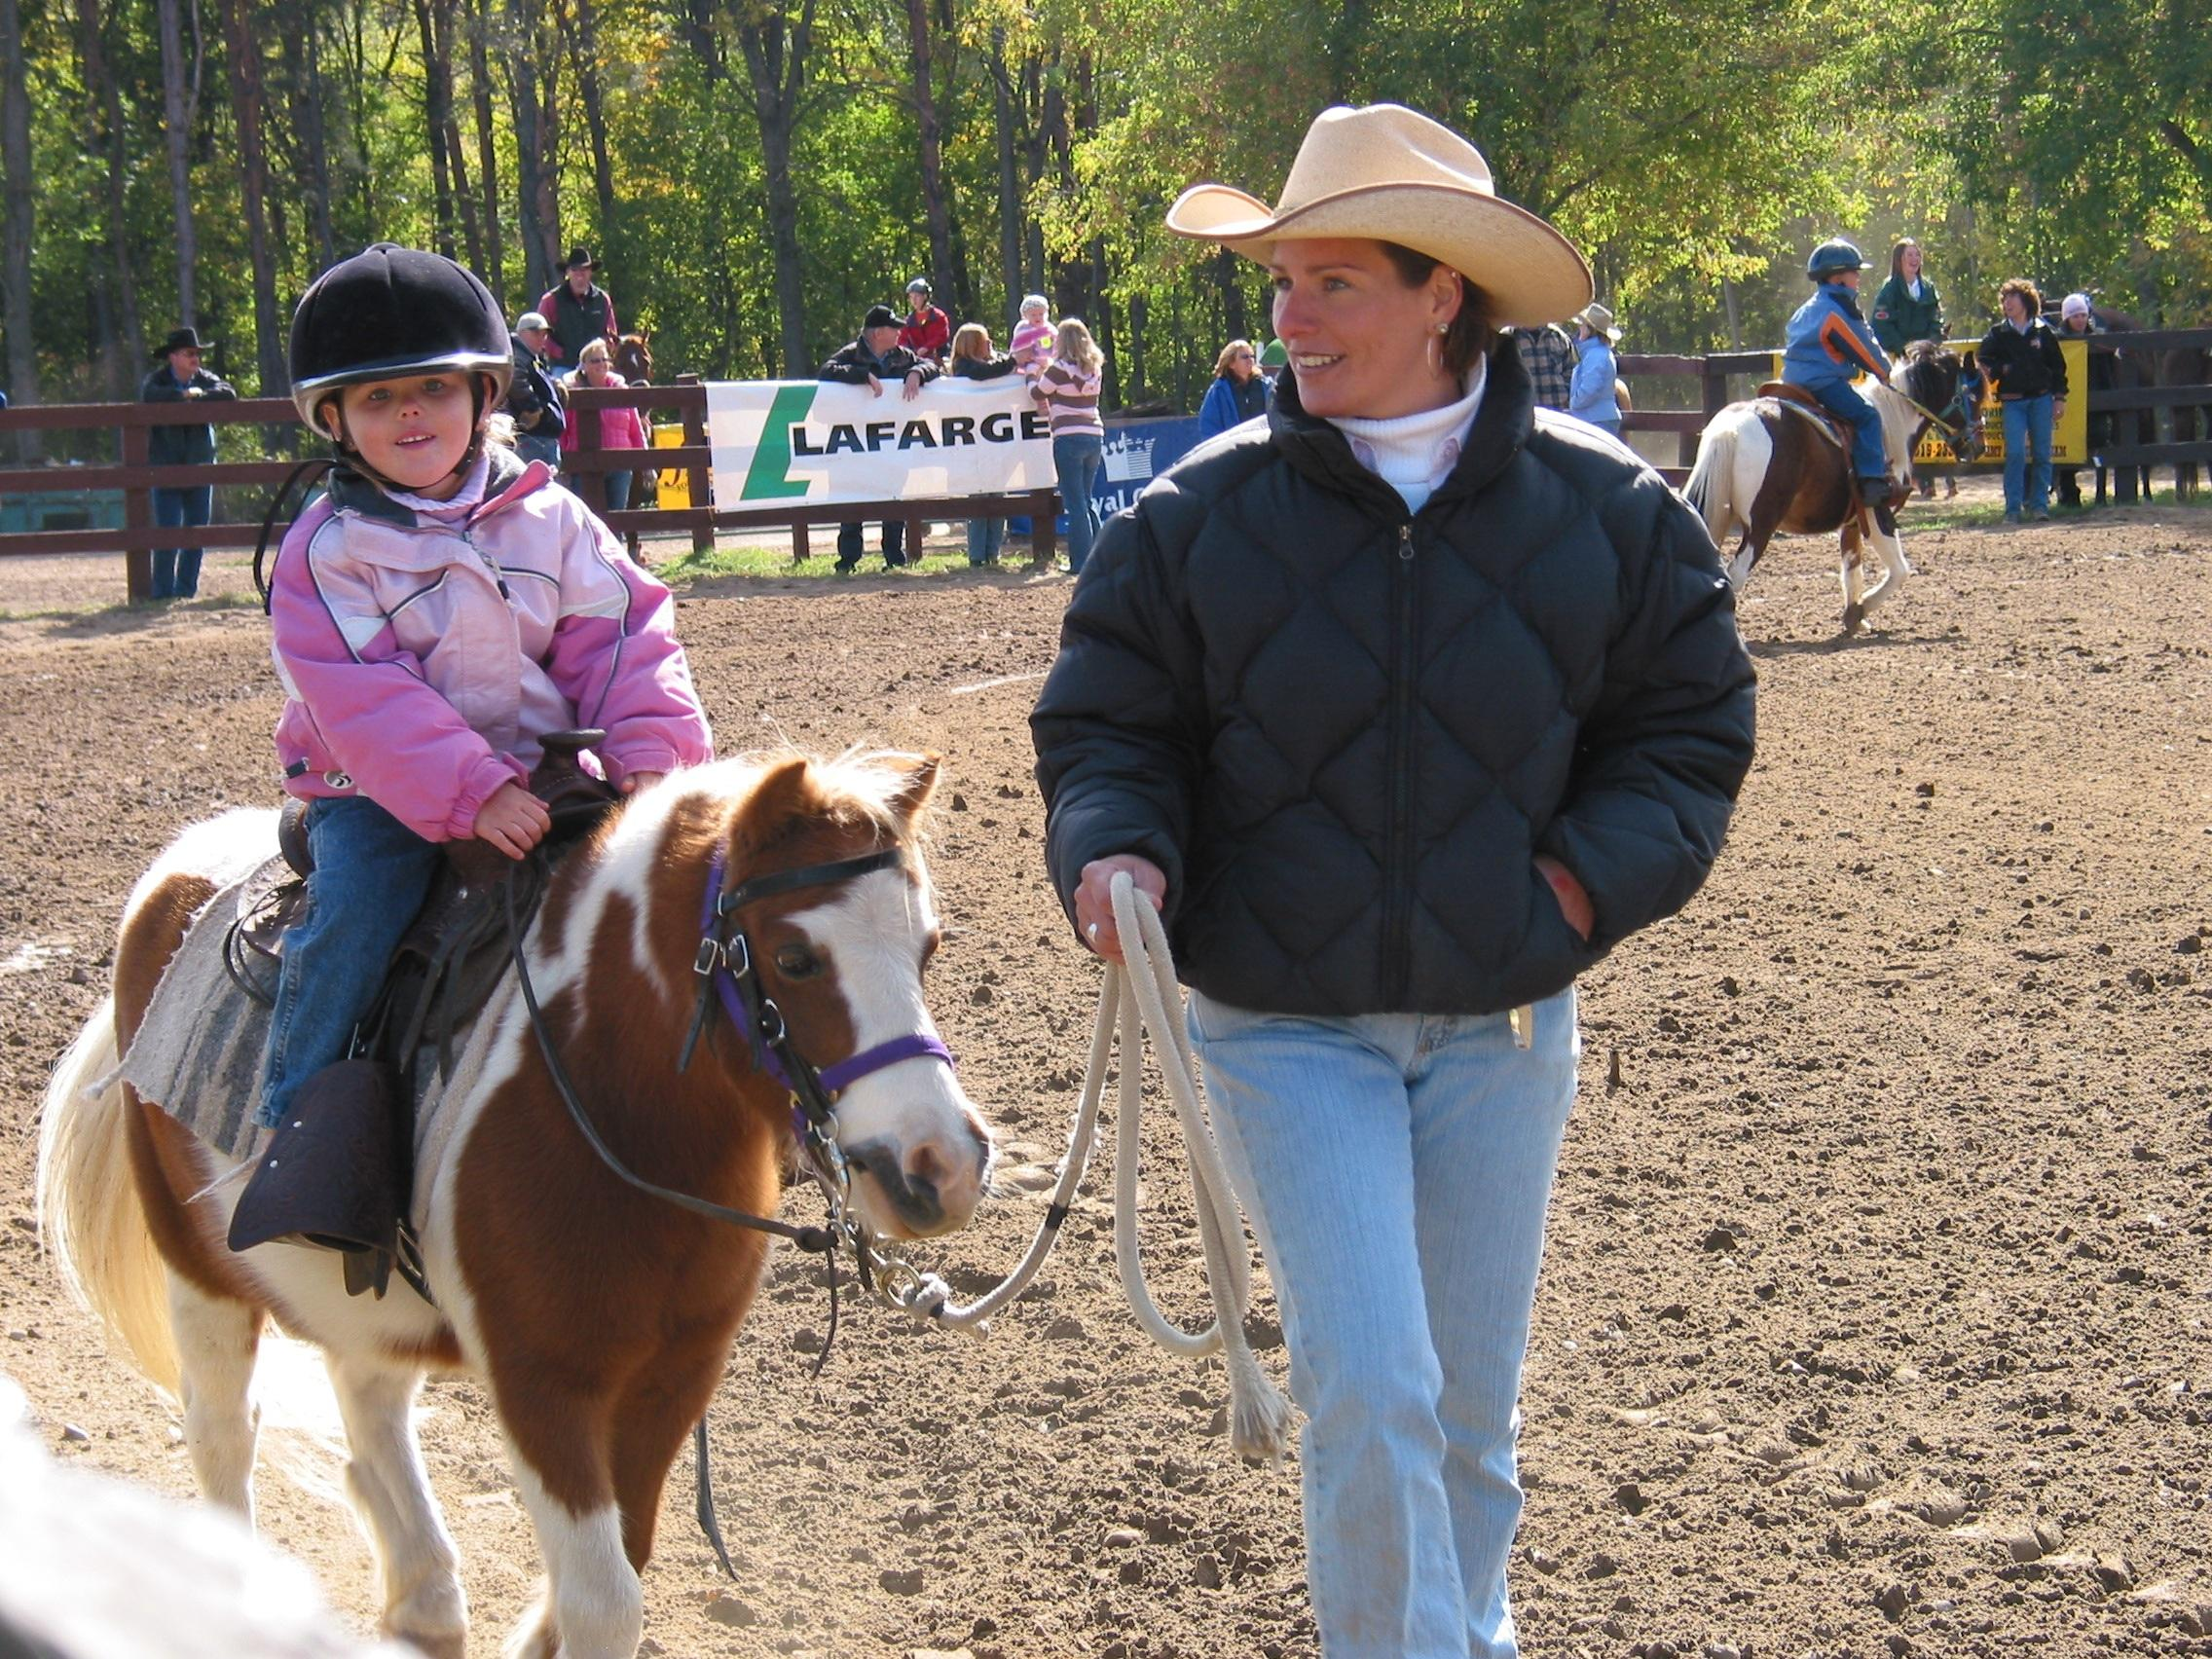 Bild Kind reitet auf Pony